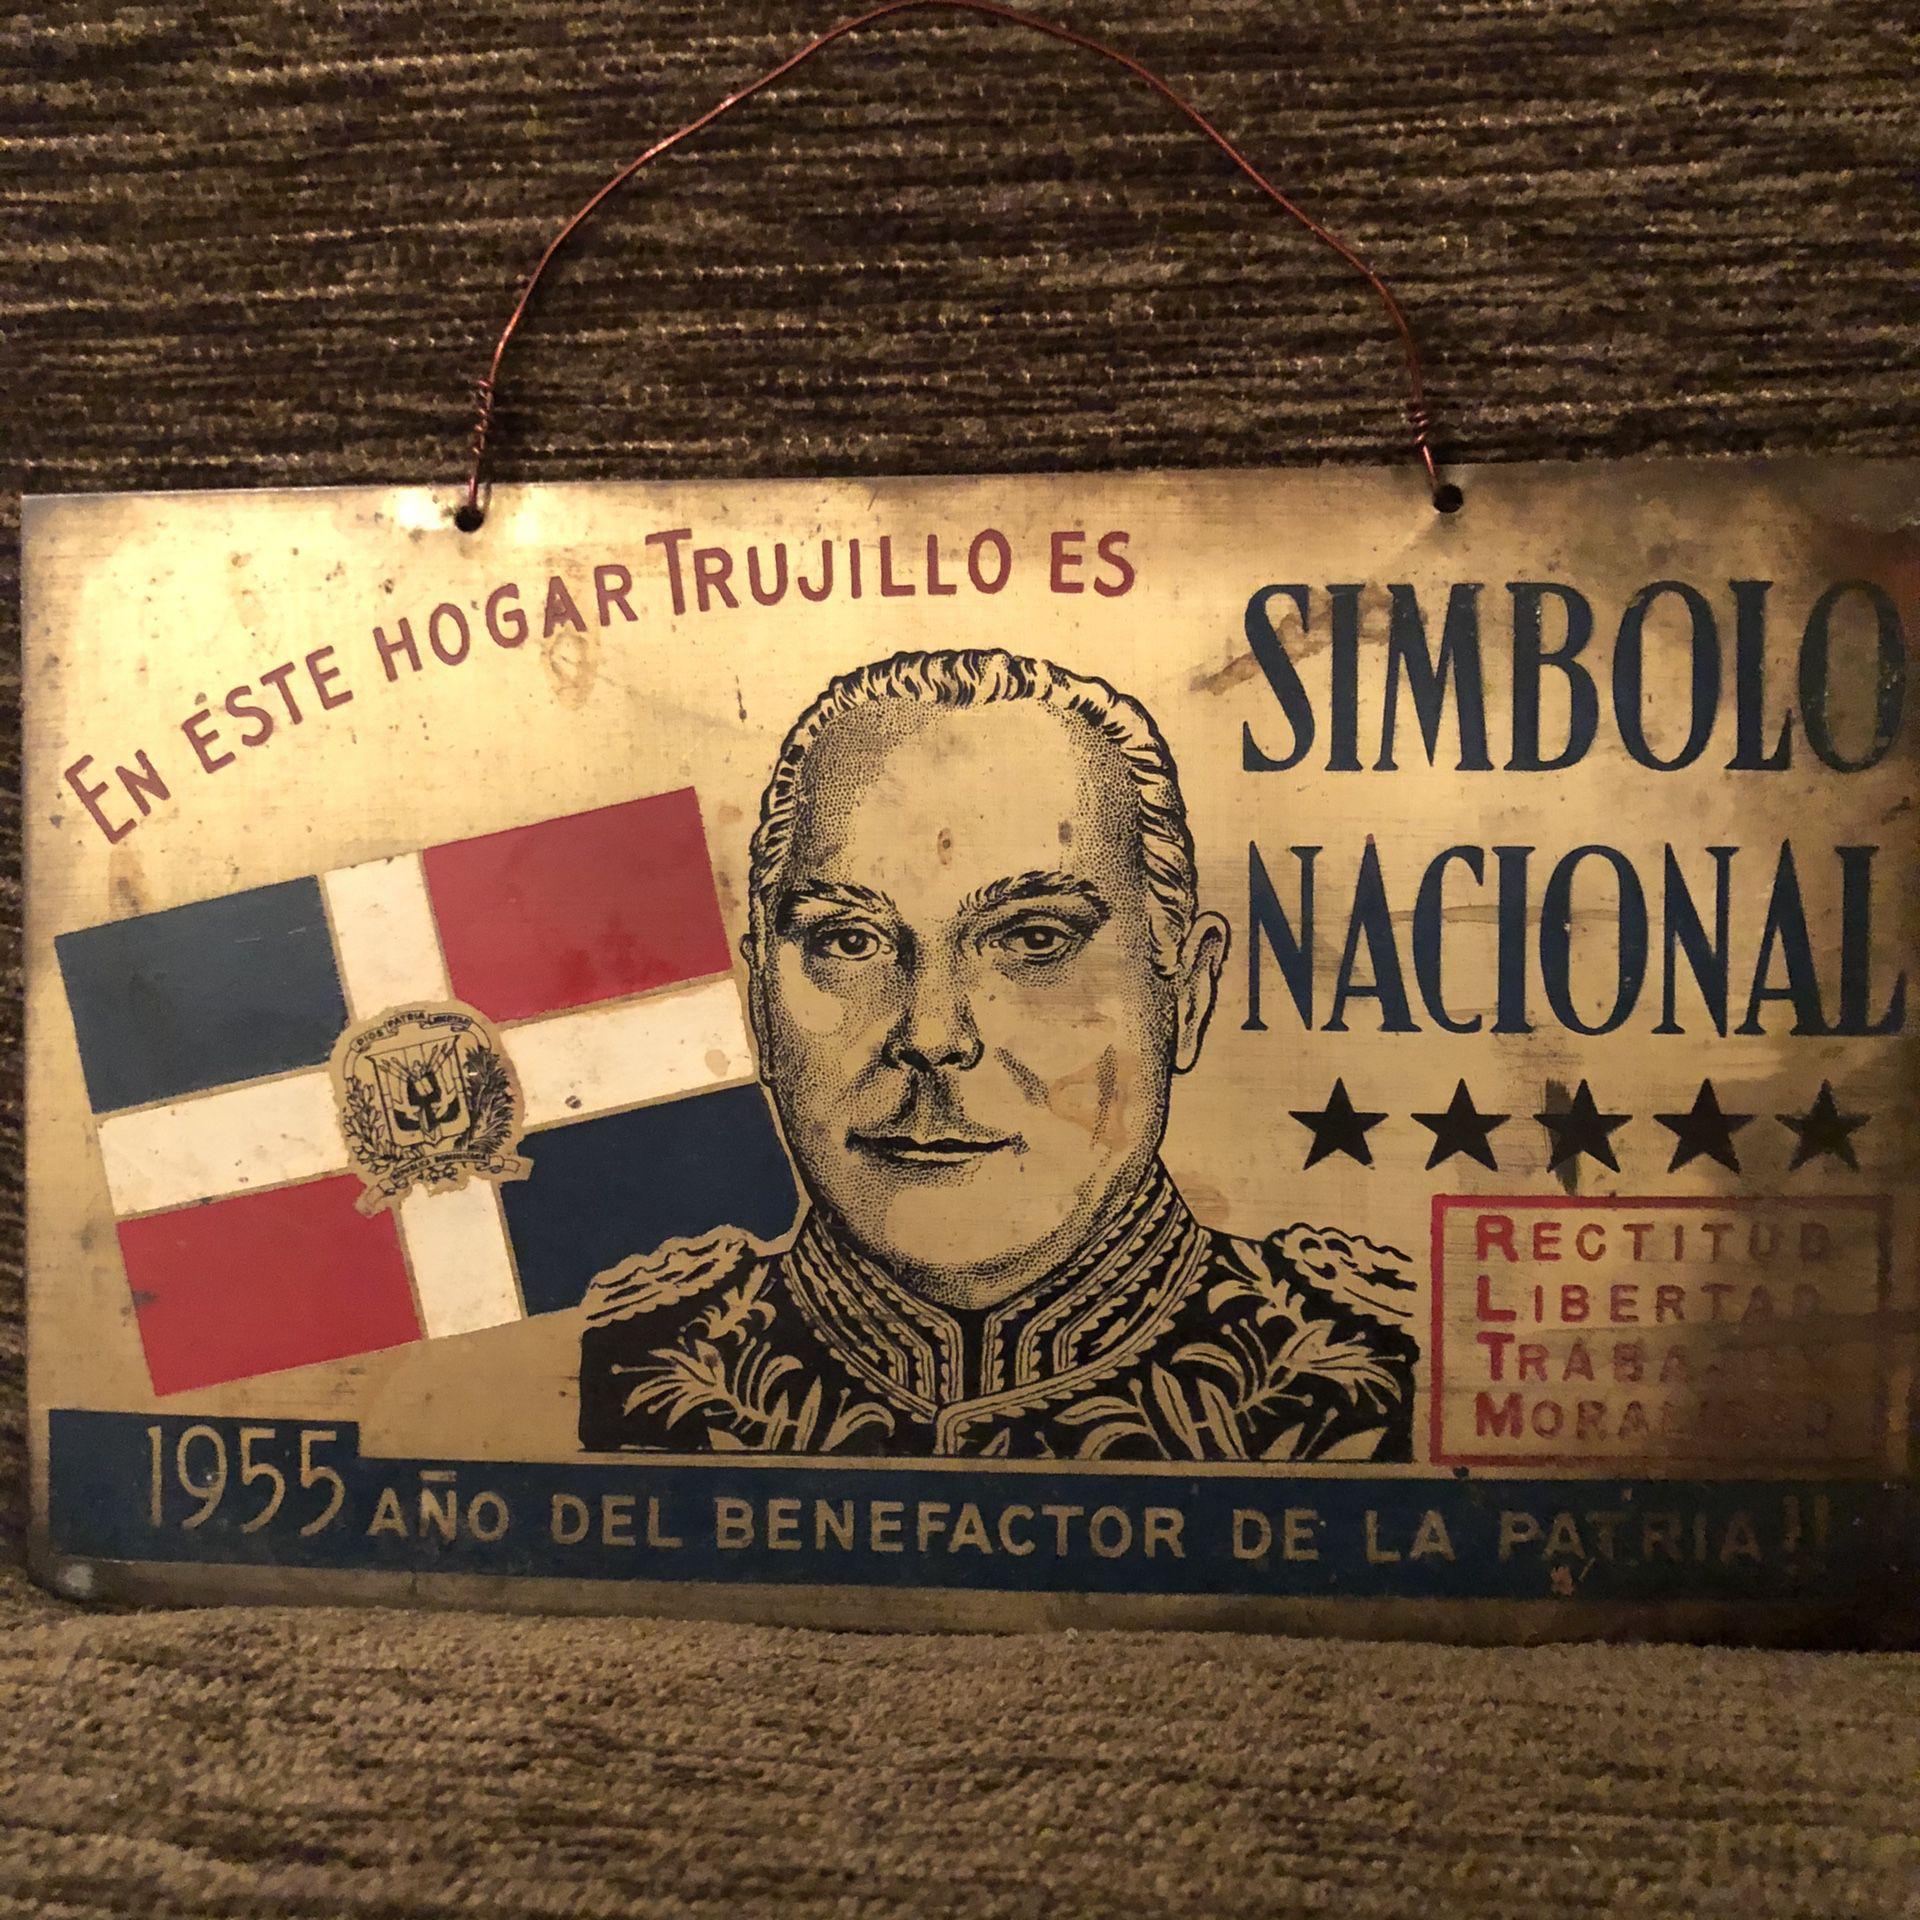 1955 Plaque from the Dominican Republic during Rafael Leonidas Trujillo rule